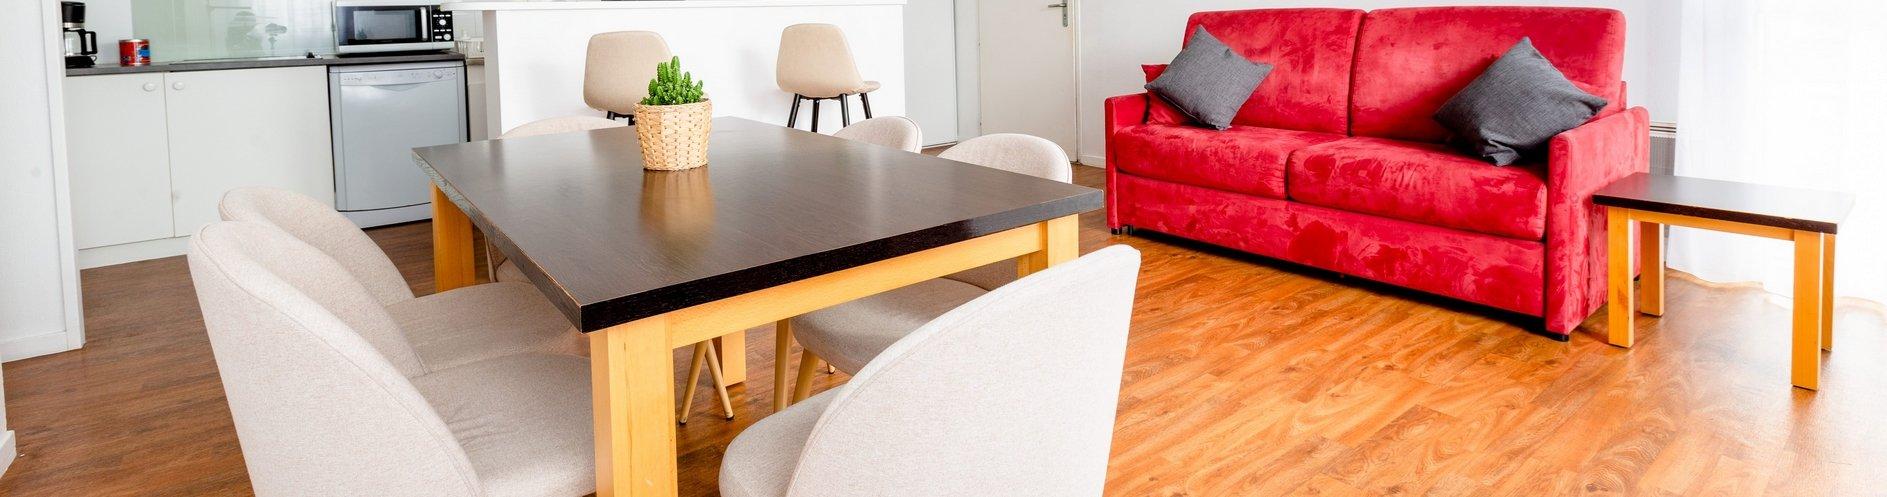 residence-cerise-nantes-atlantis-appartement-6-personnes.jpg